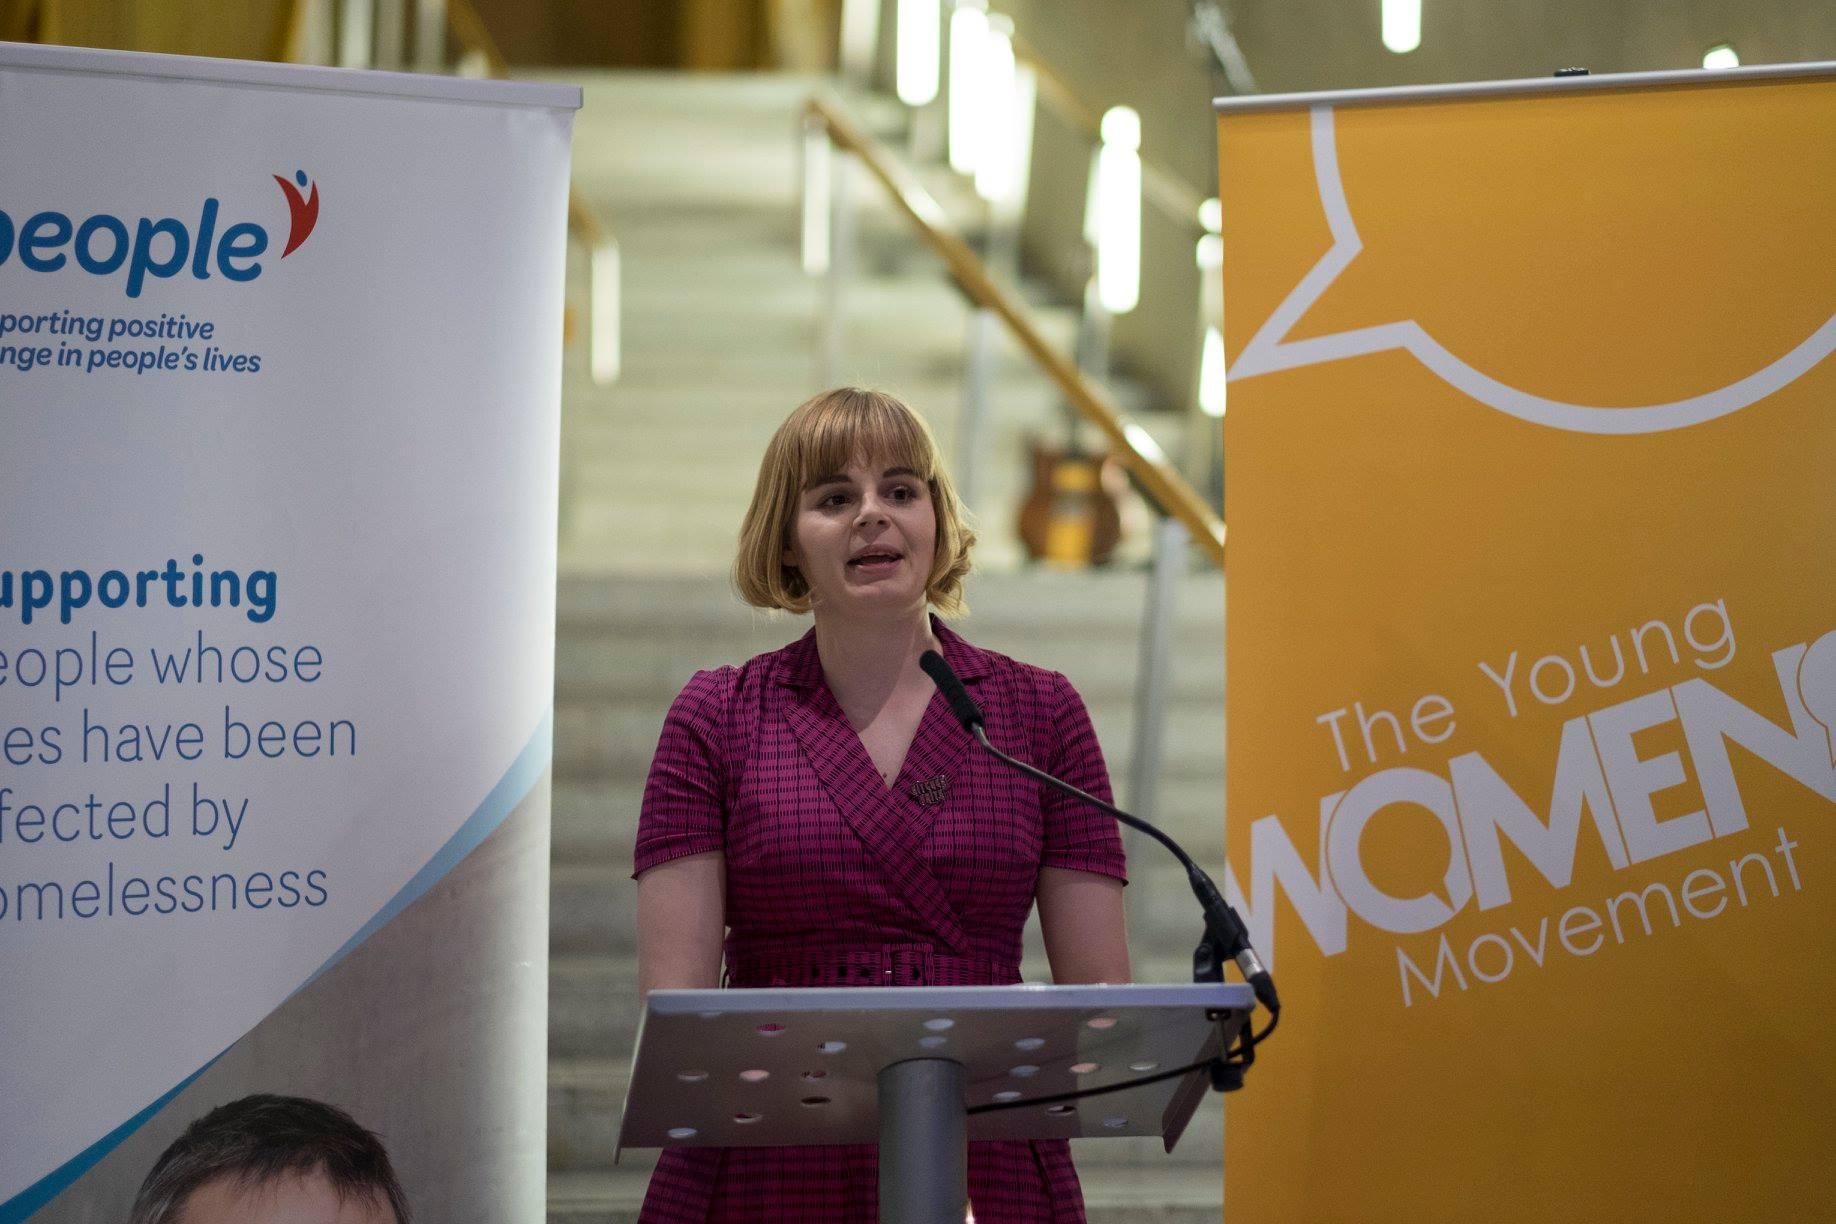 Patrycja giving a keynote speech at Scottish Parliament.